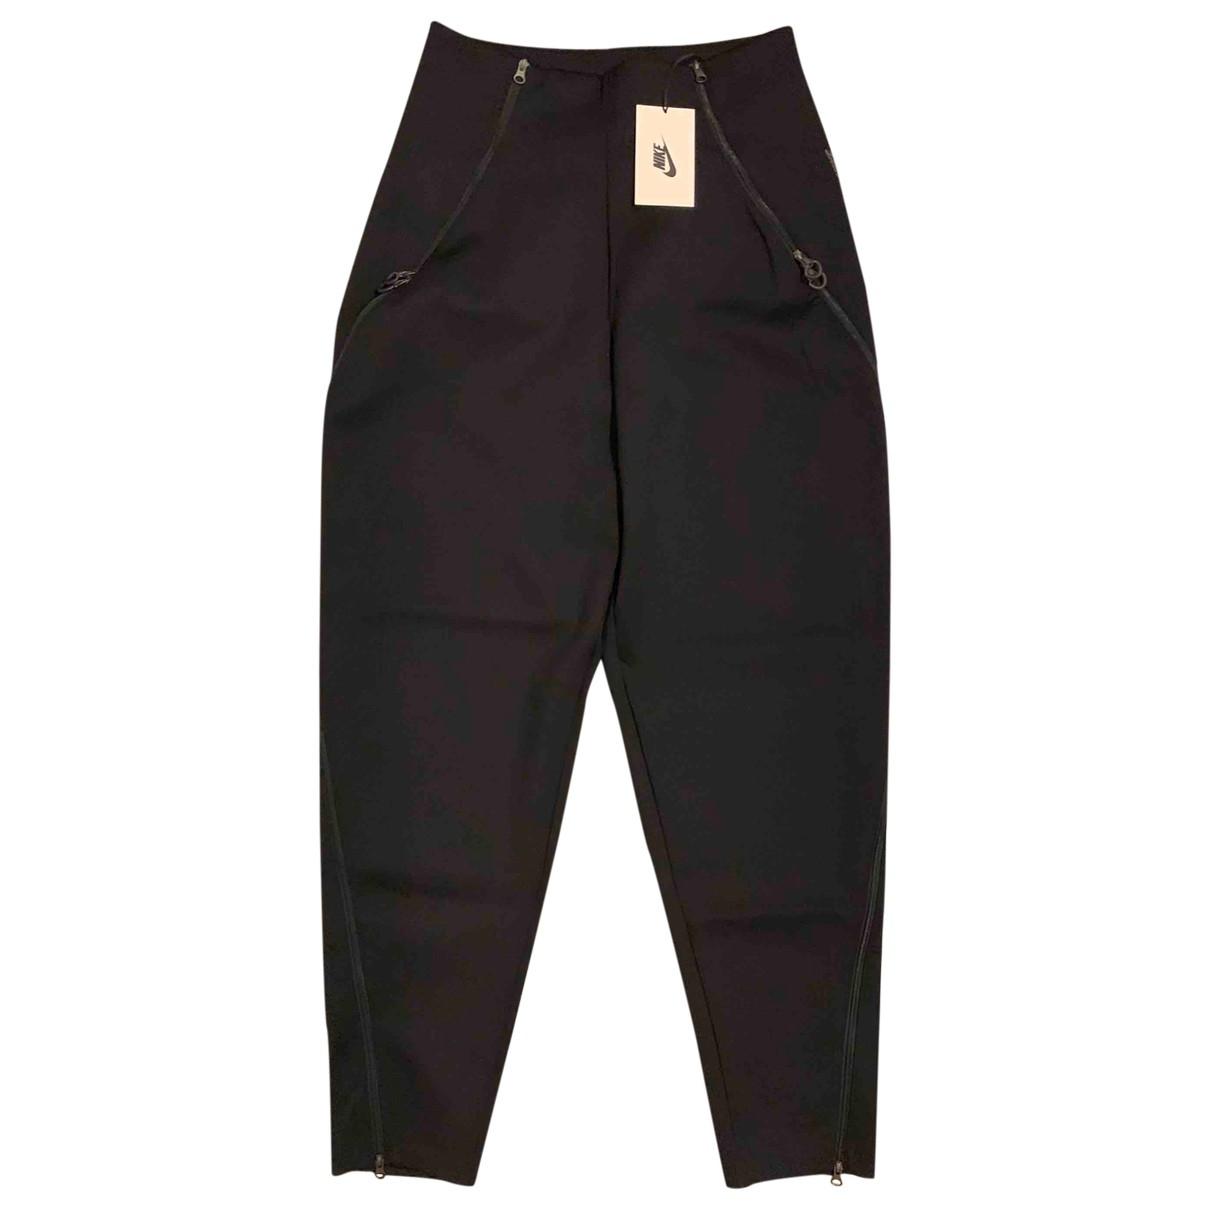 Nike \N Black Spandex Trousers for Women M International